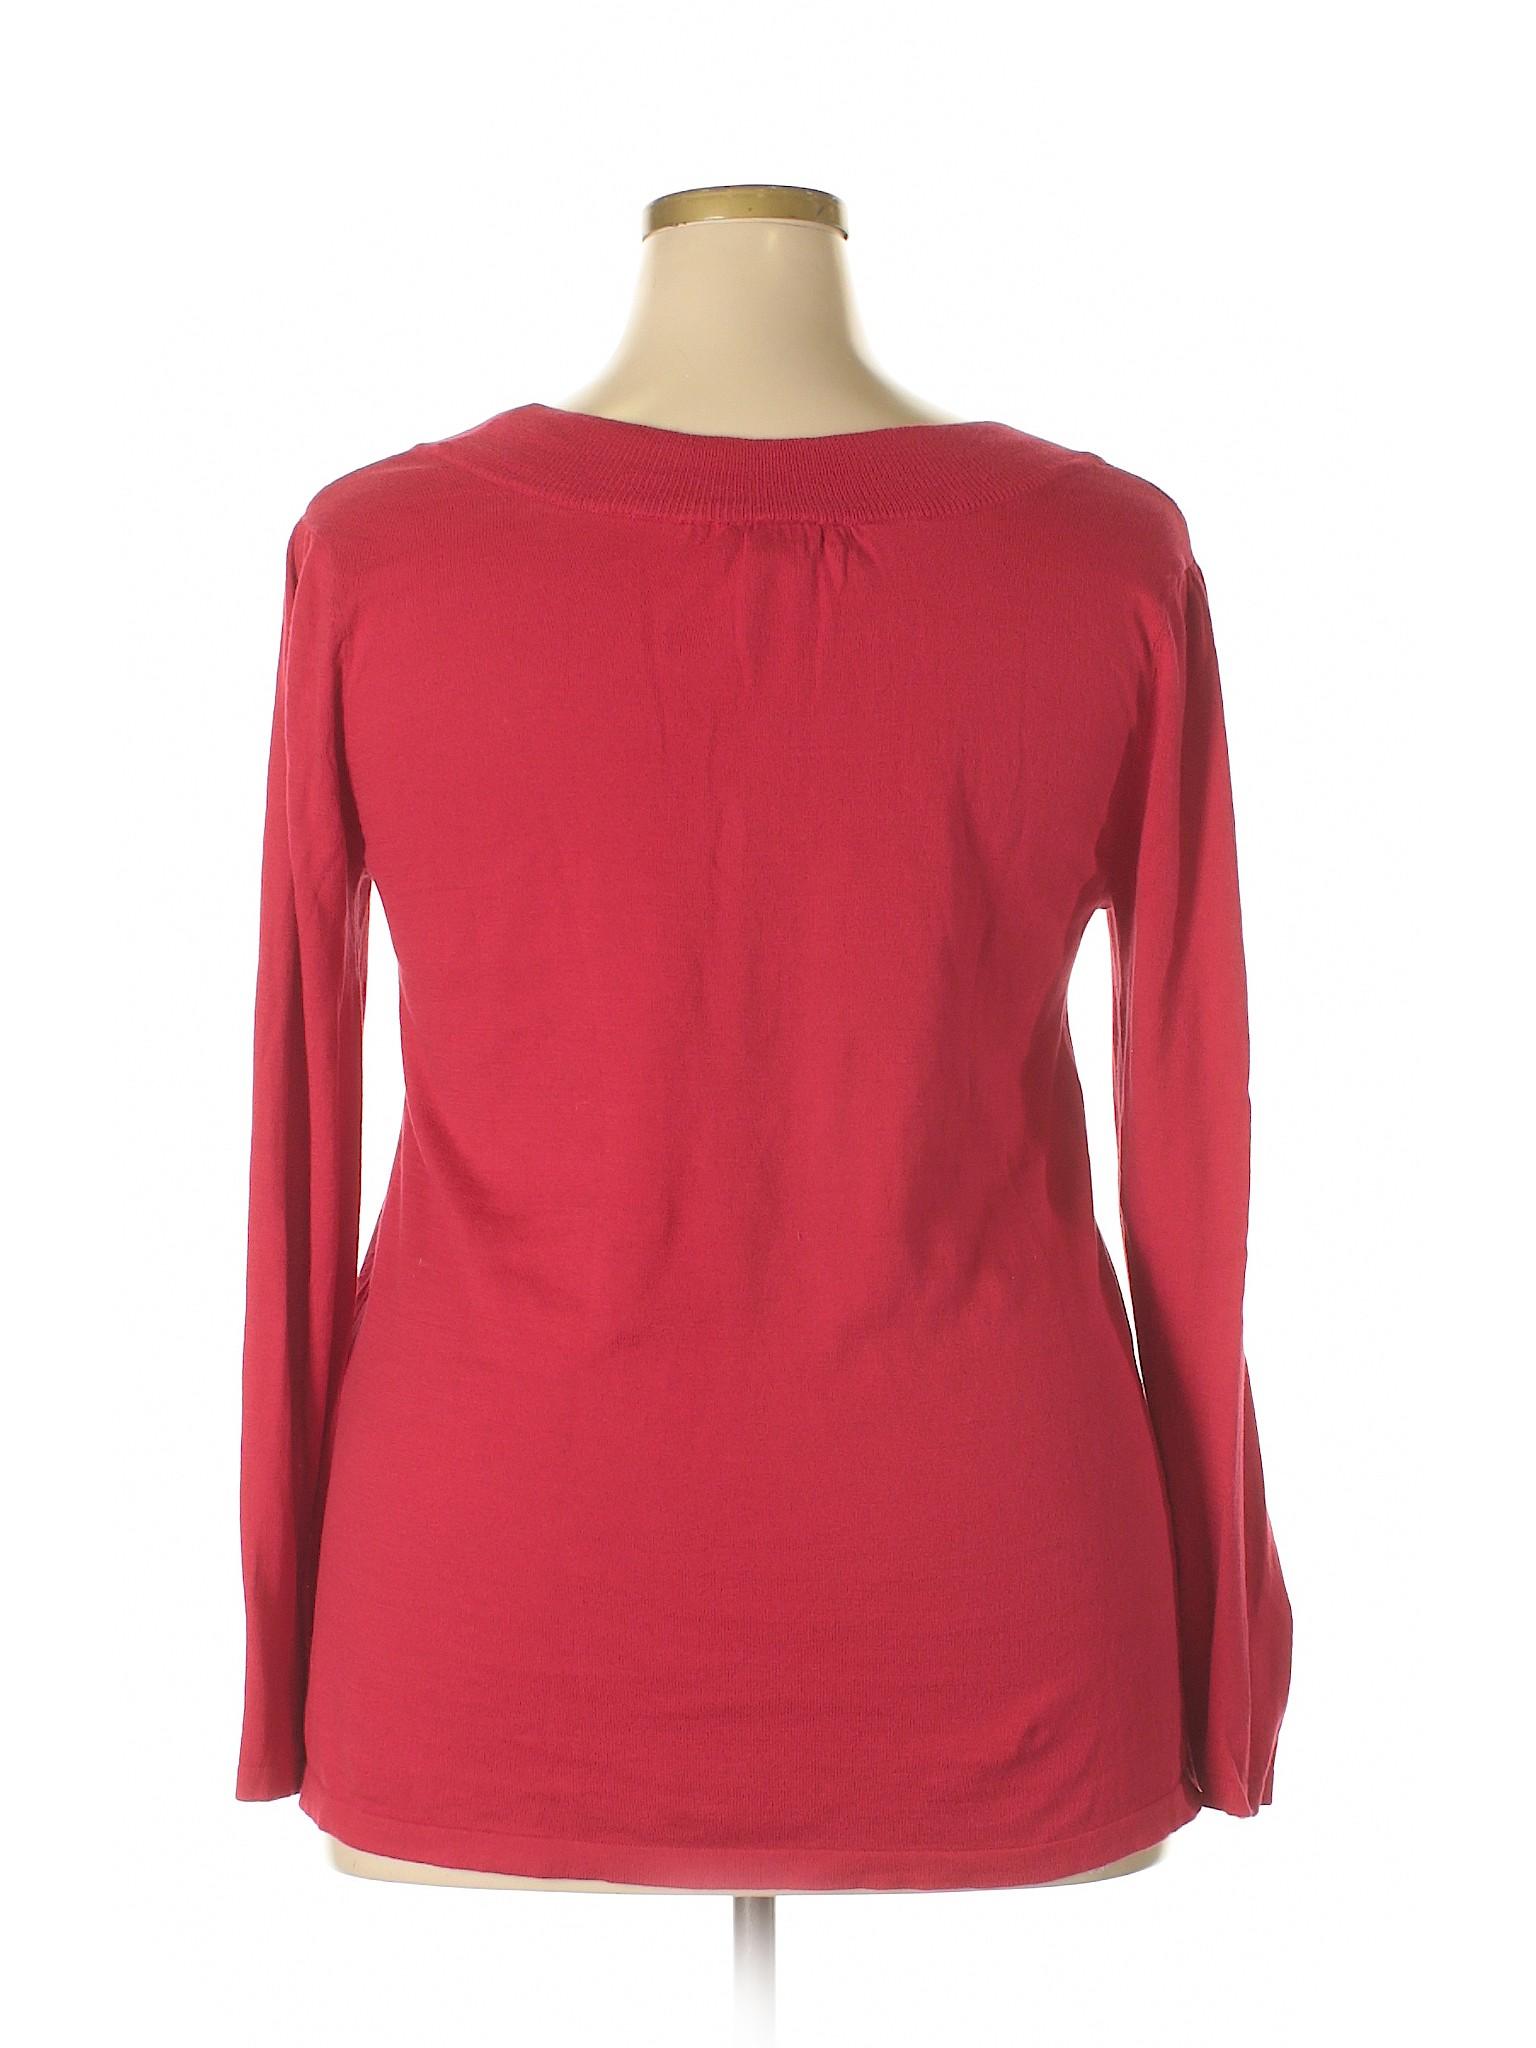 Lane Bryant Sweater Boutique Lane Boutique Pullover xYqzw4wEn